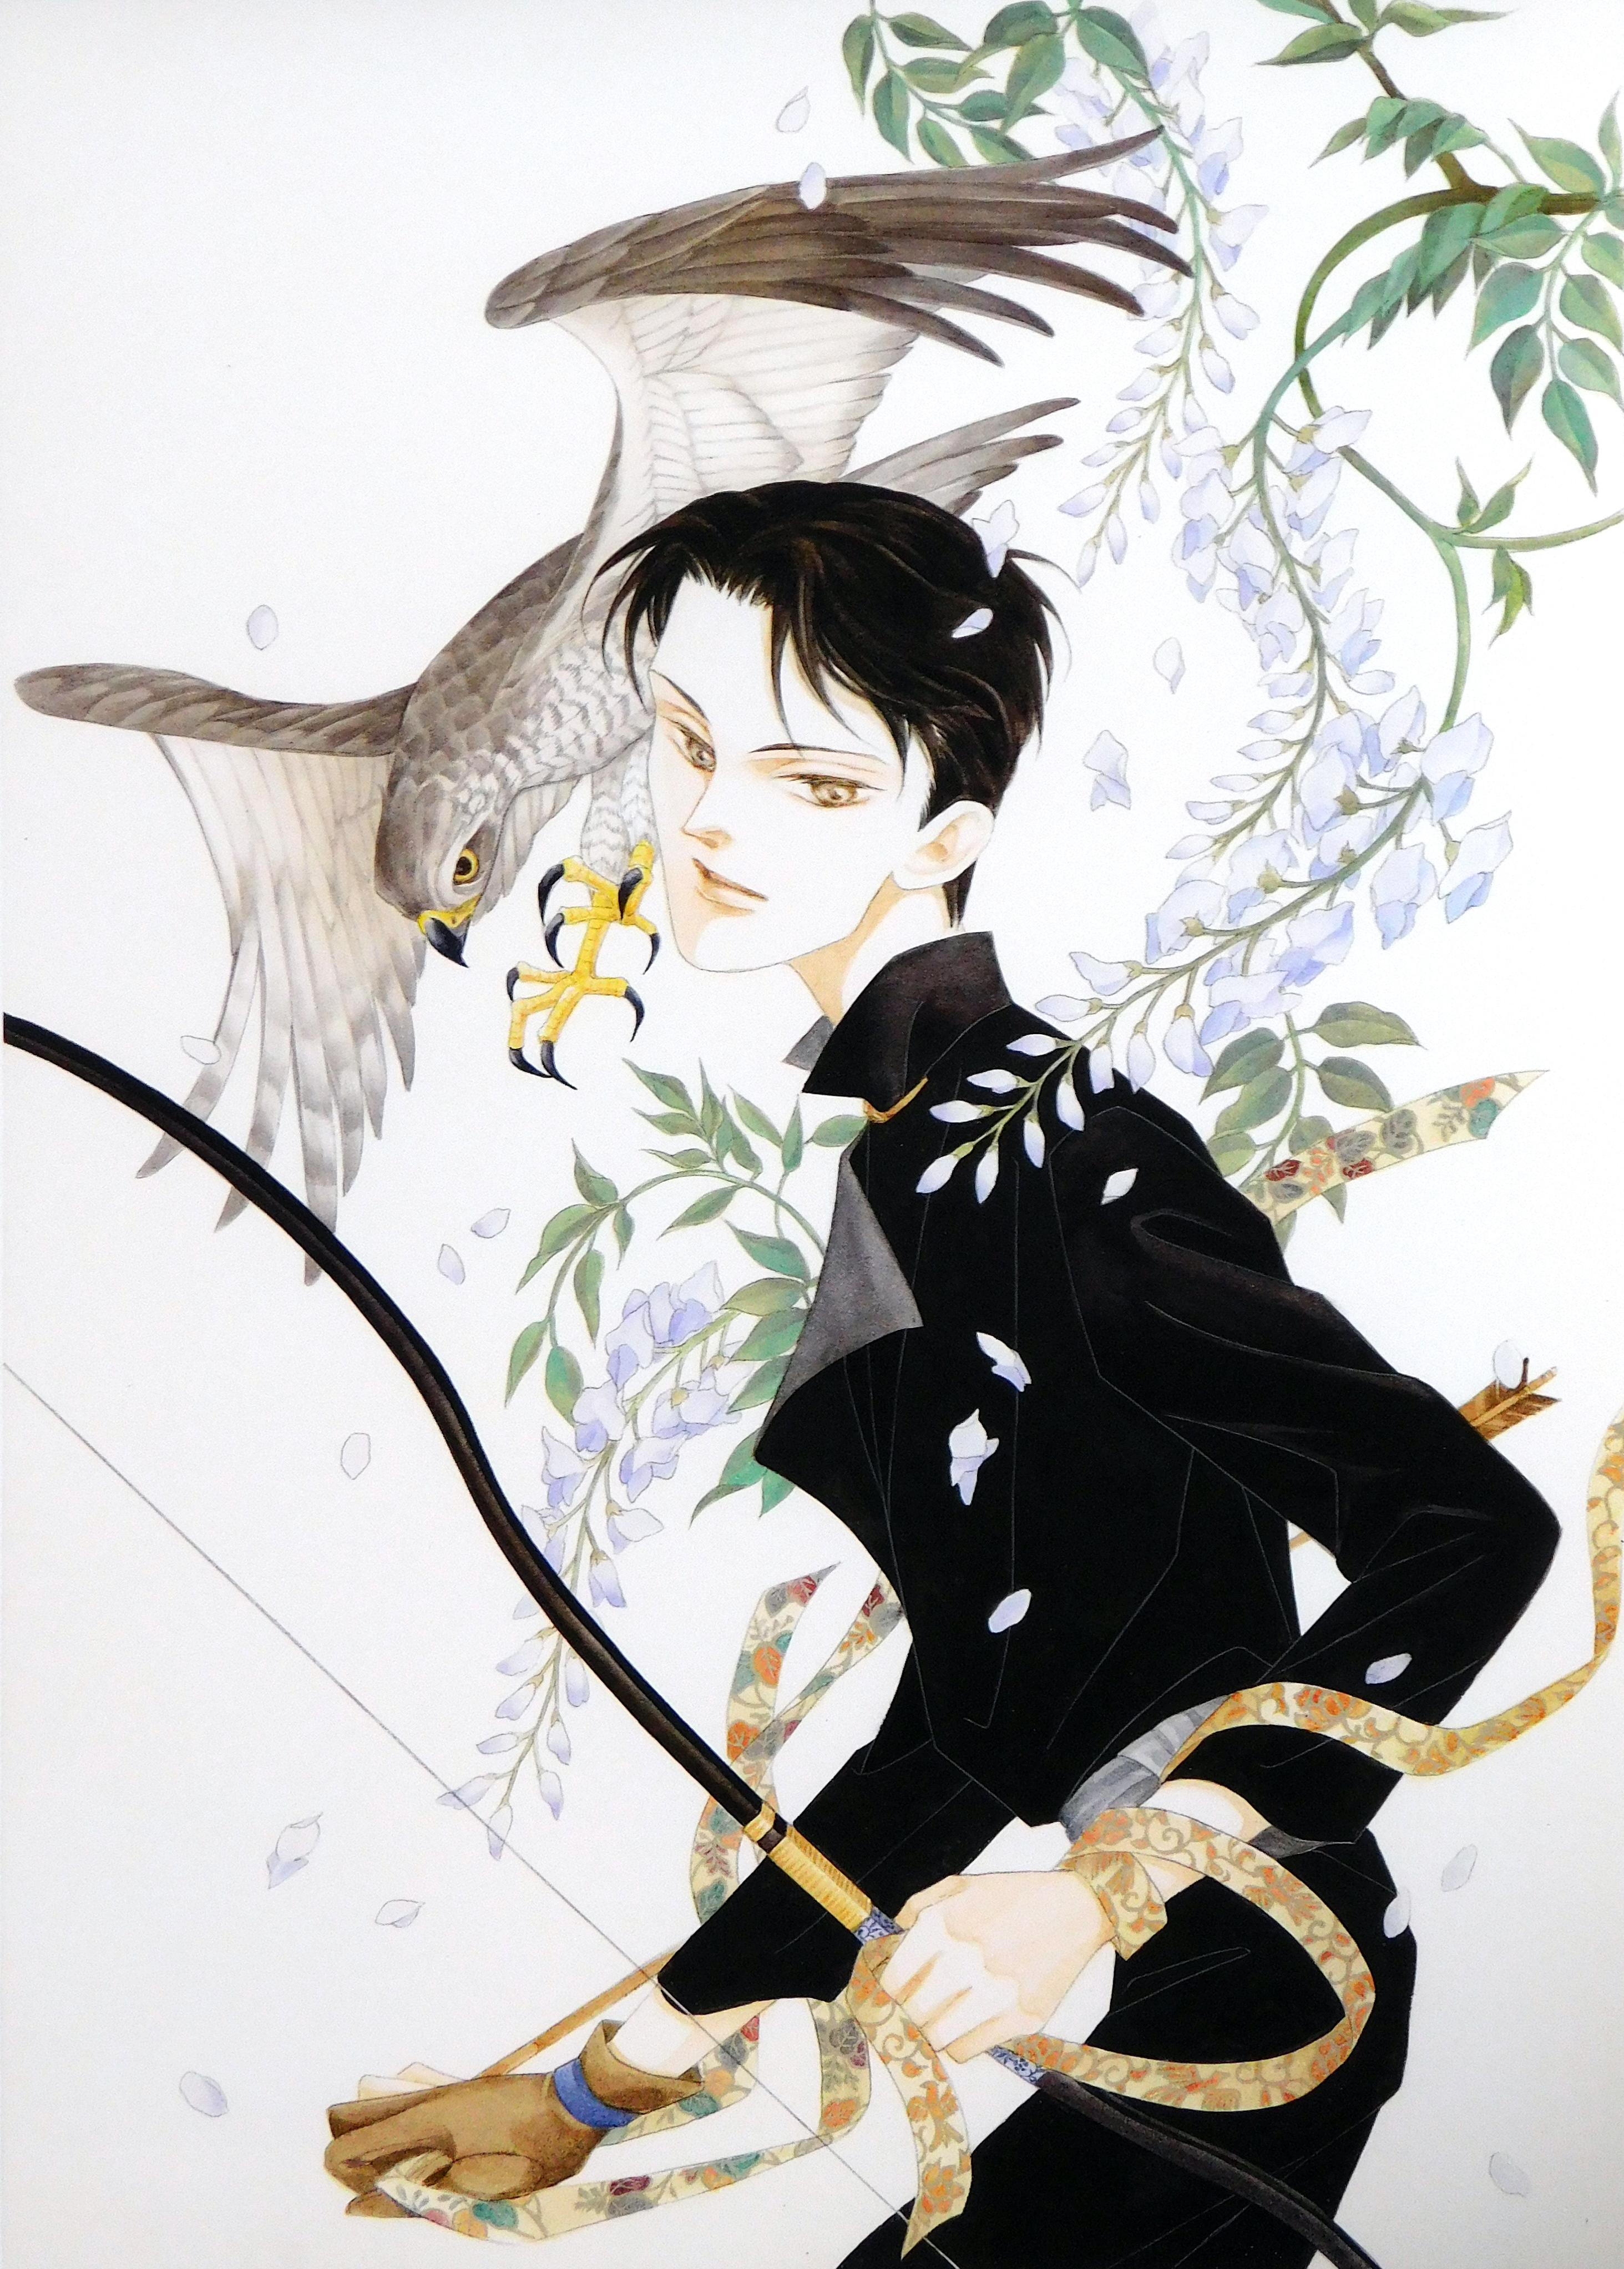 Cover for Nemuki magazine, Akiko Hatsu, 2001